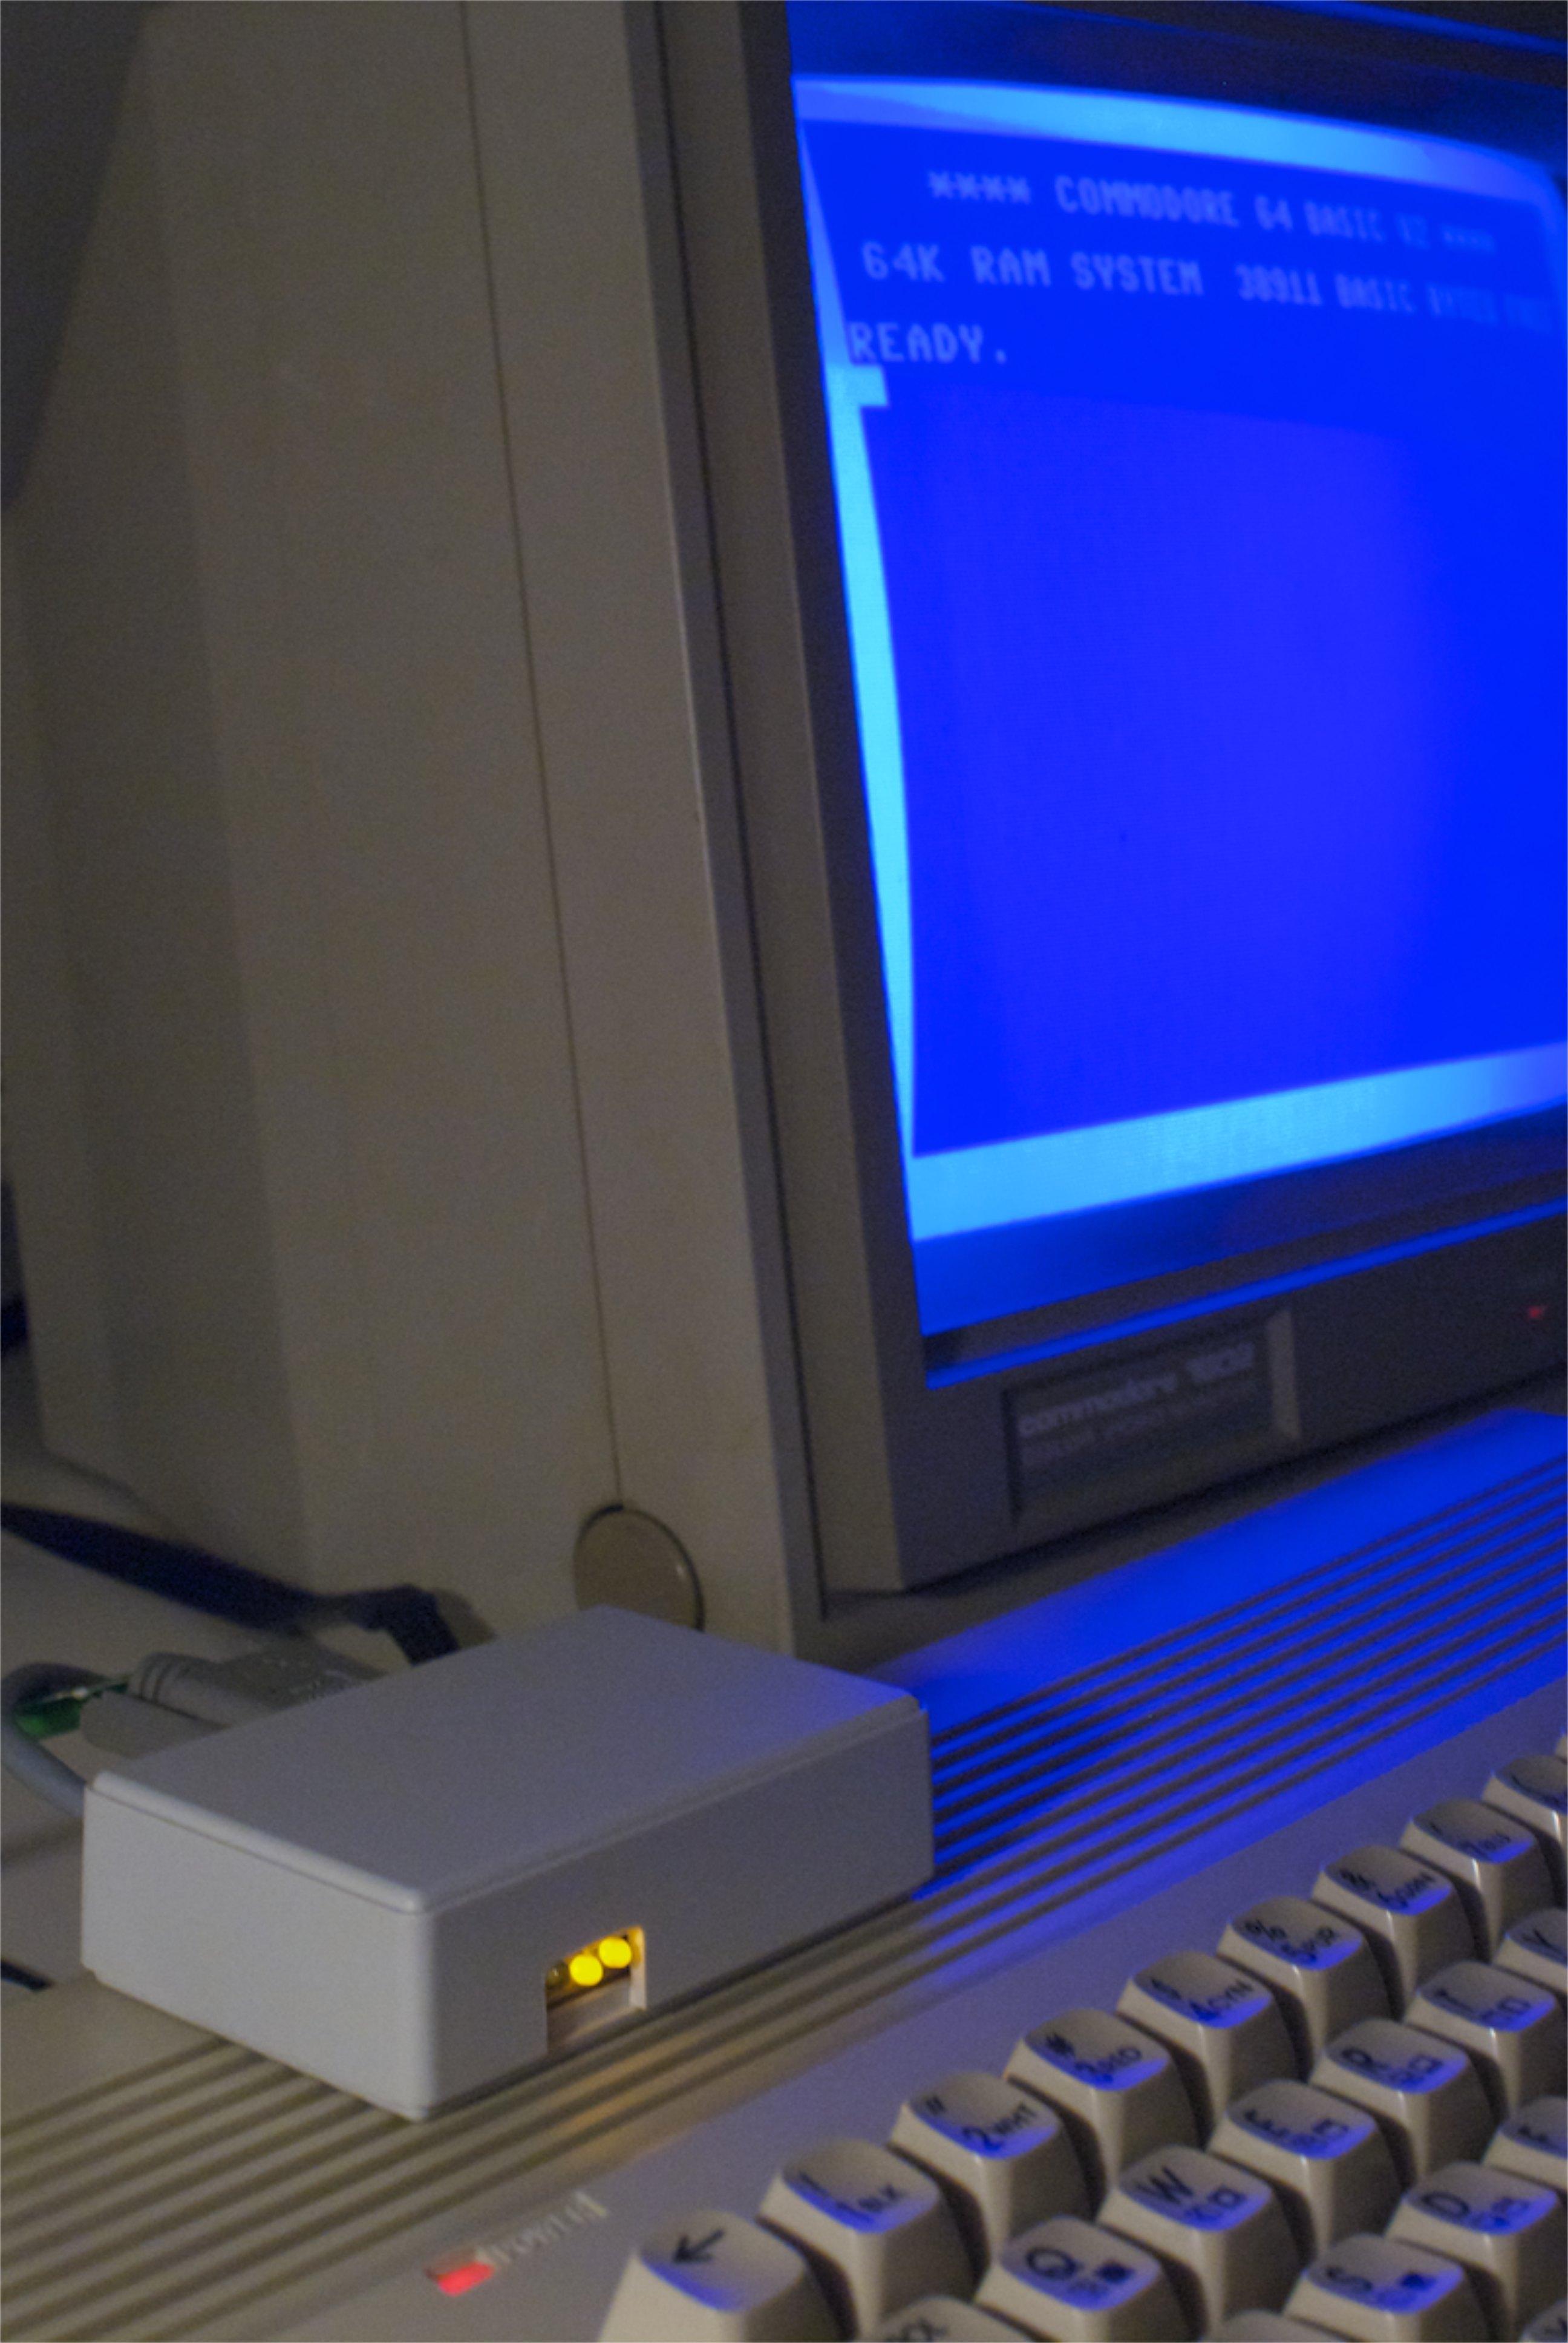 C64TPC on top of Commodore 64C